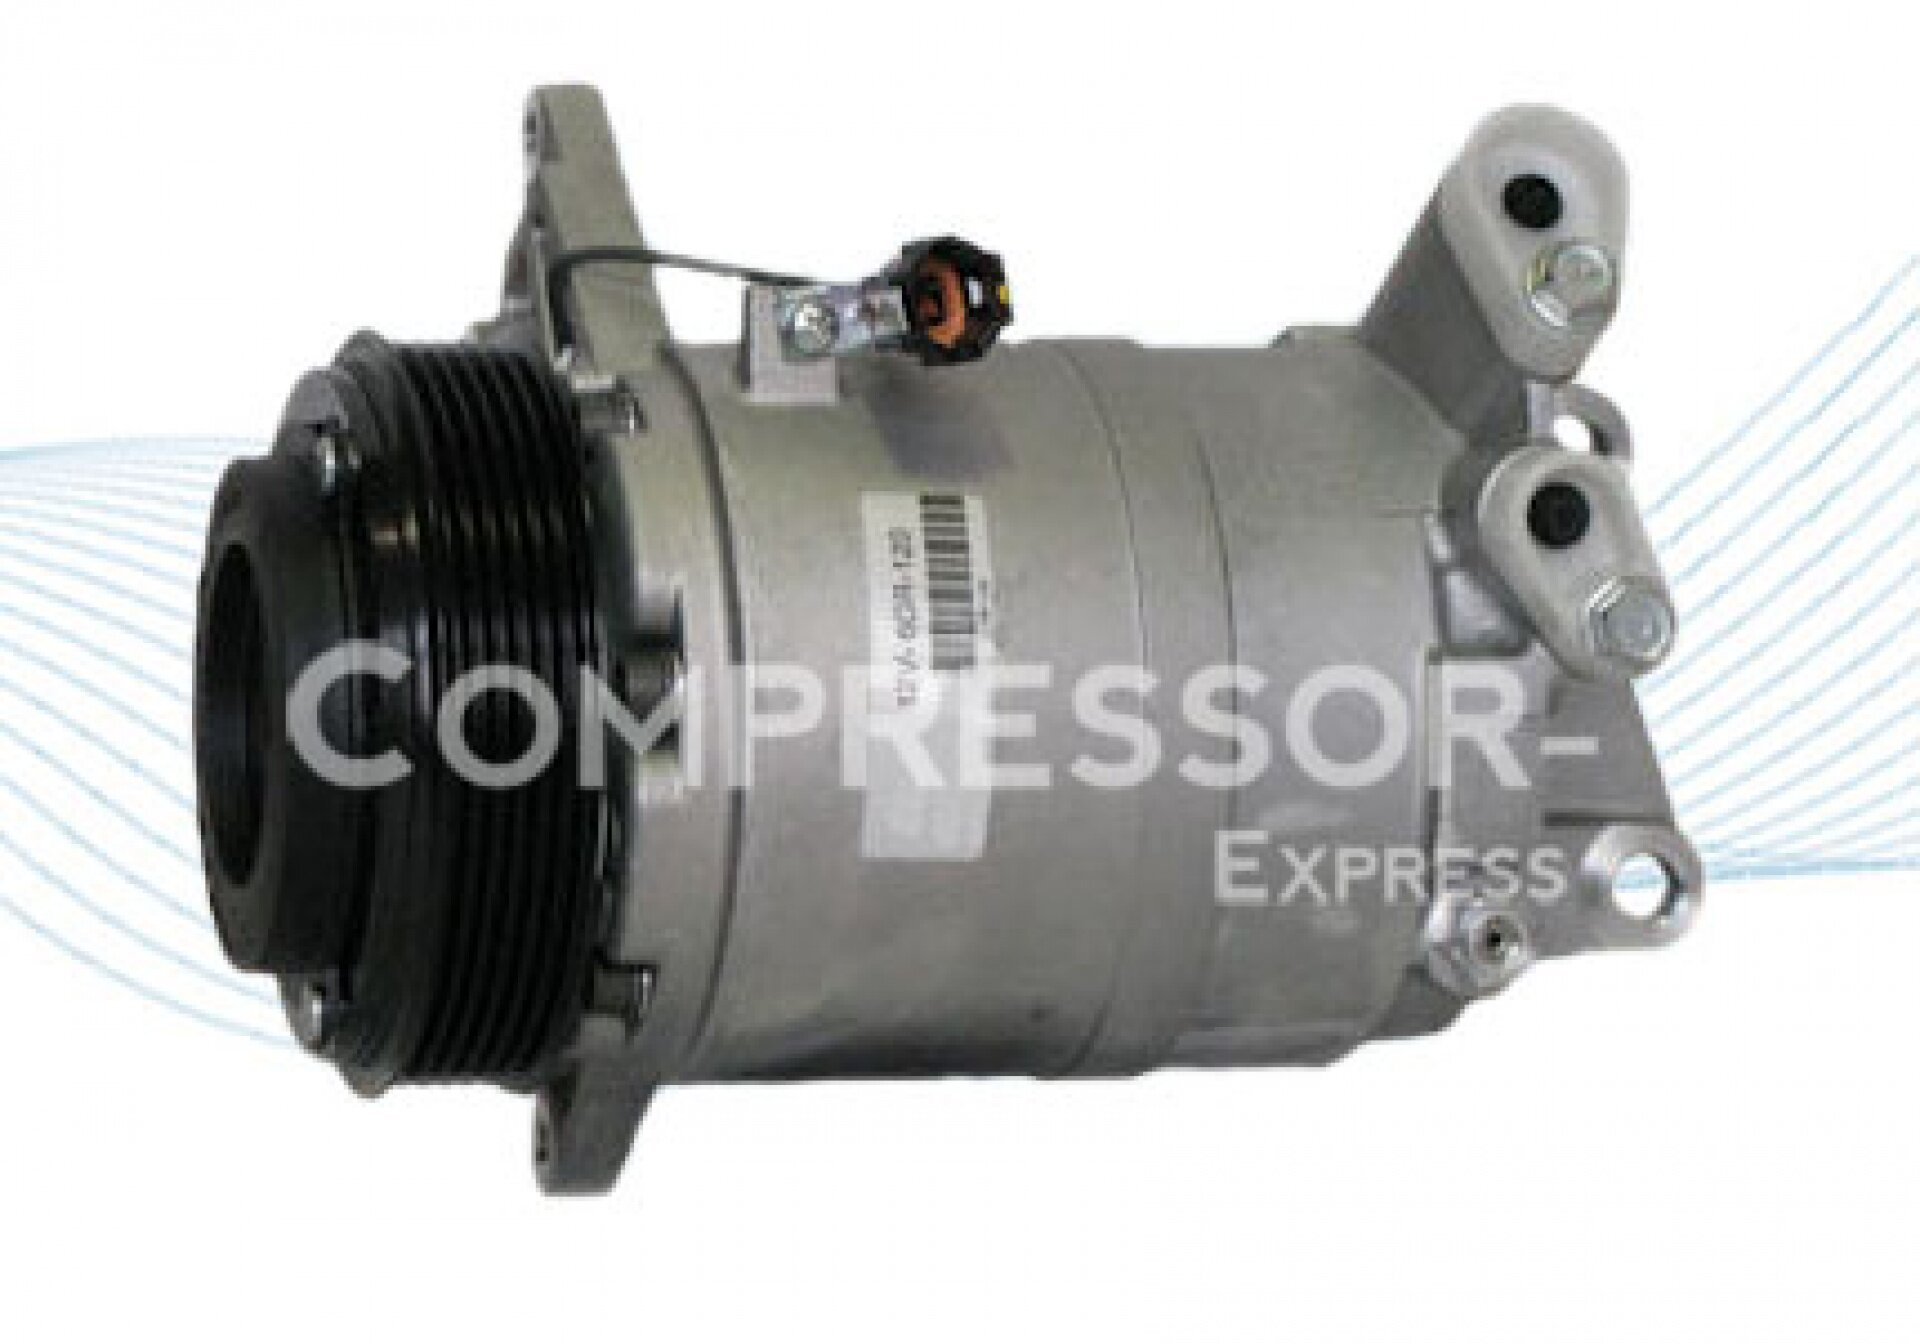 Zexel dks 17ds compresor de aire acondicionado 506012 0282 for Compresor de aire acondicionado